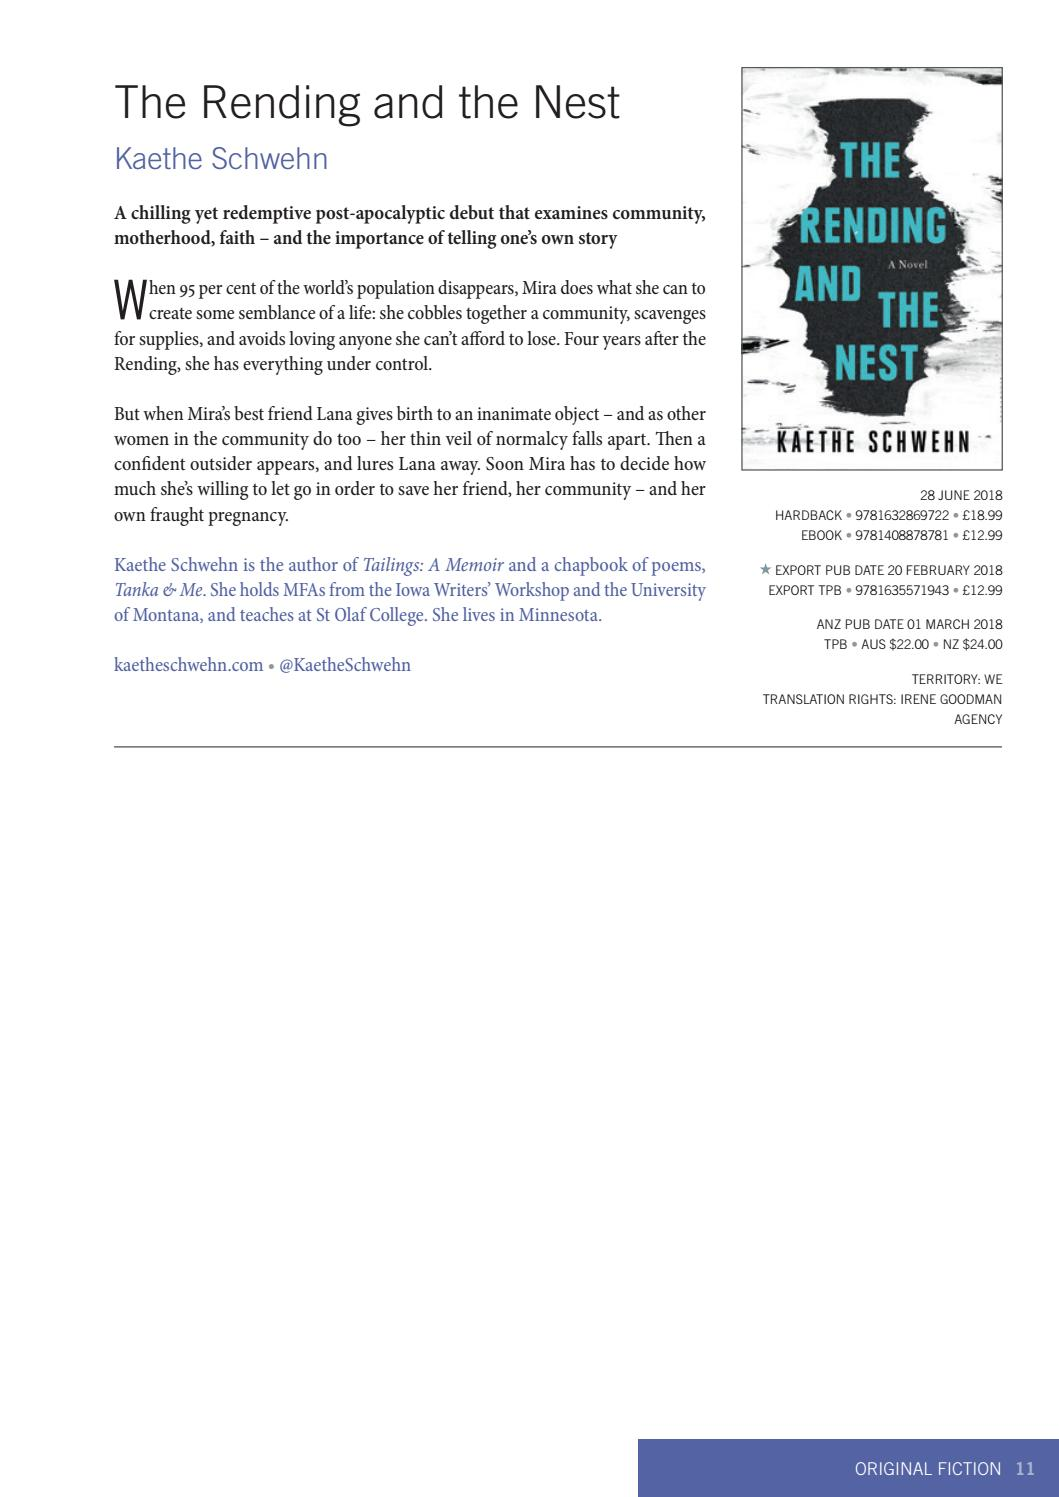 Bloomsbury Adult New Titles January - June 2018 by Bloomsbury